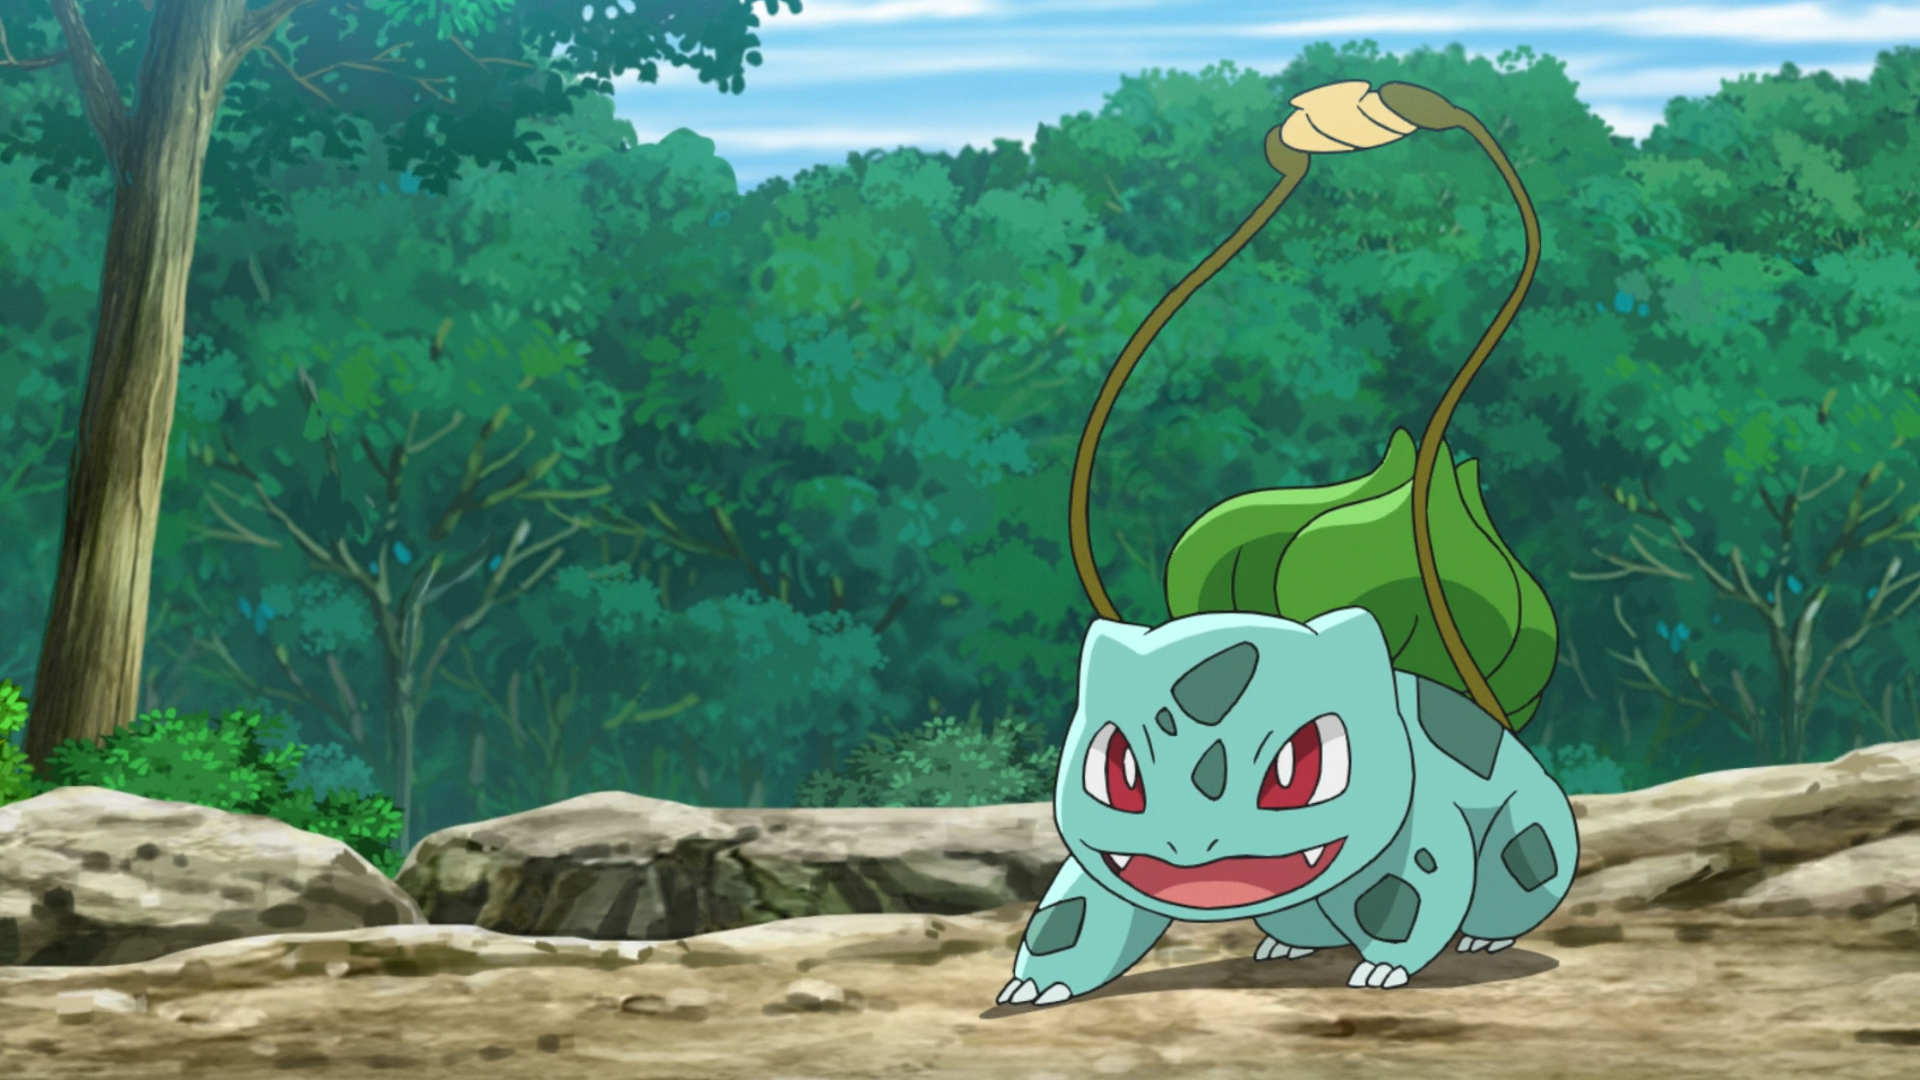 Kiseki inicia en pueblo paleta! Ash_Bulbasaur